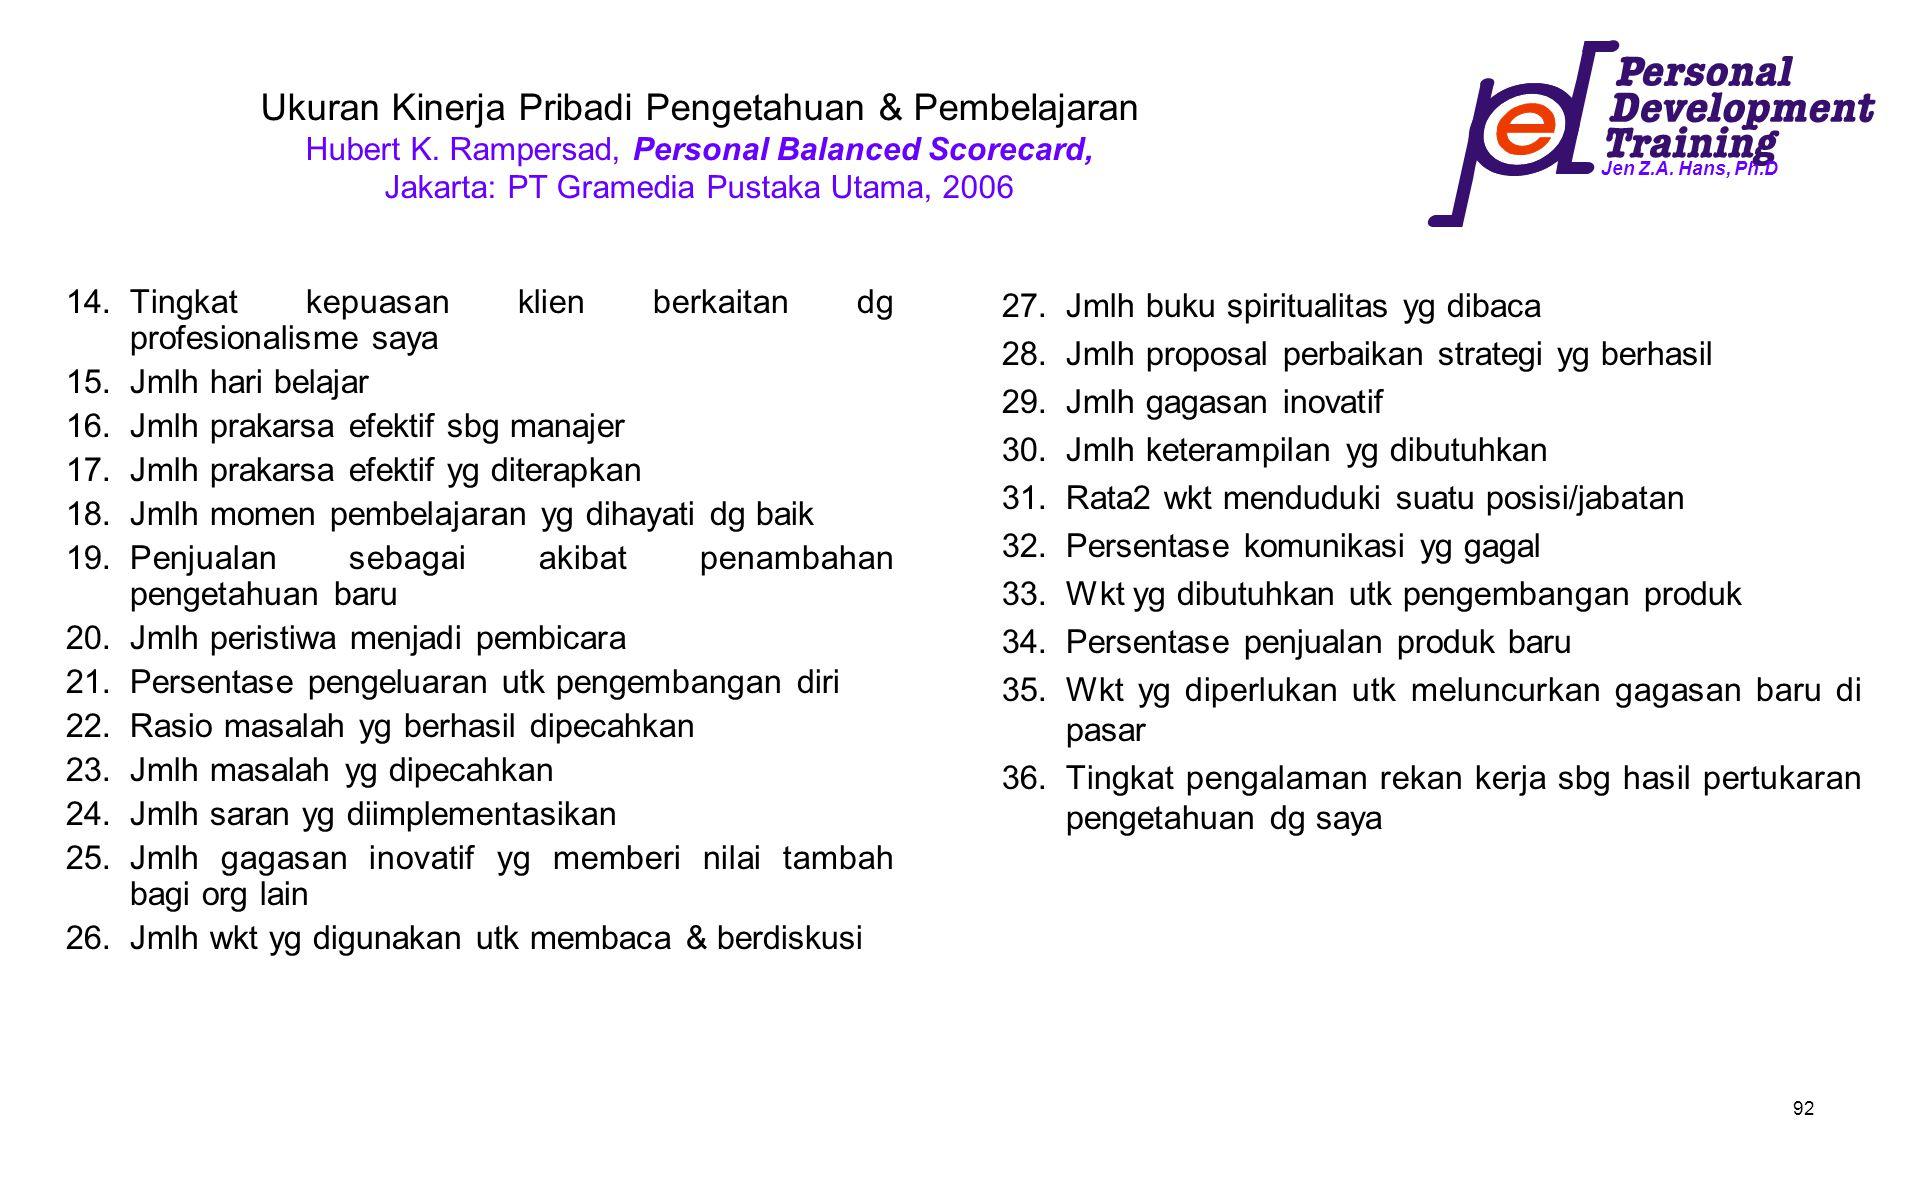 Jen Z.A. Hans, Ph.D 92 Ukuran Kinerja Pribadi Pengetahuan & Pembelajaran Hubert K. Rampersad, Personal Balanced Scorecard, Jakarta: PT Gramedia Pustak